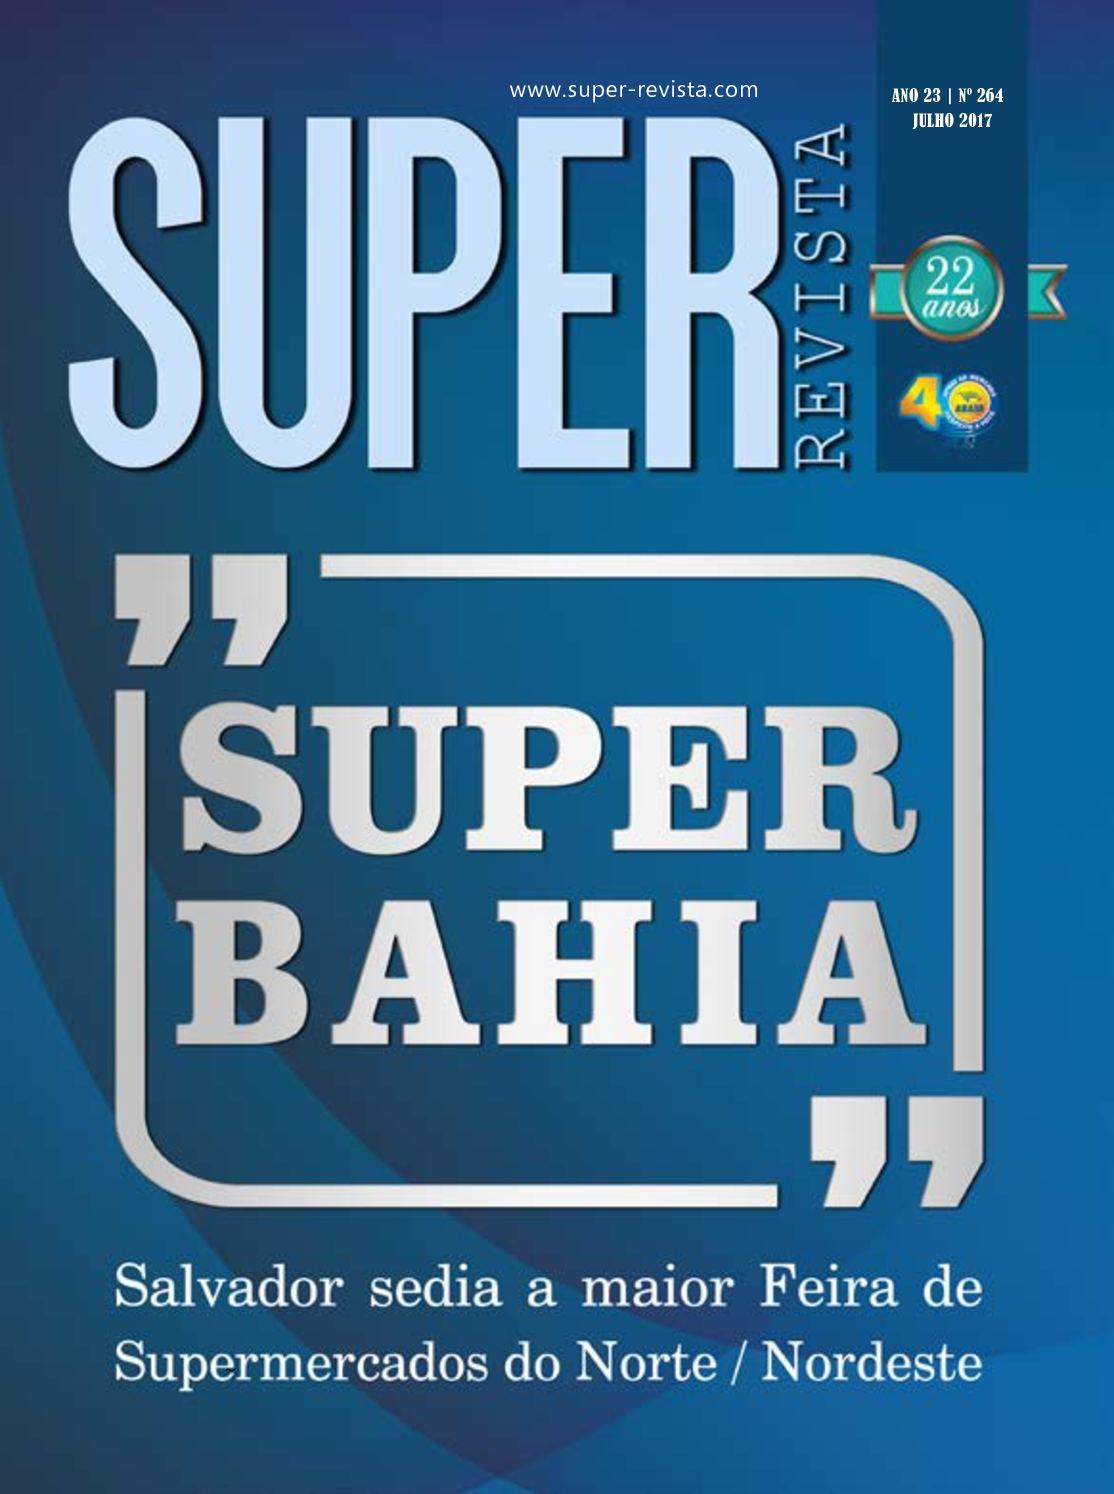 Calaméo - Abase - Super Revista - Julho 2017 1a58a60e5e